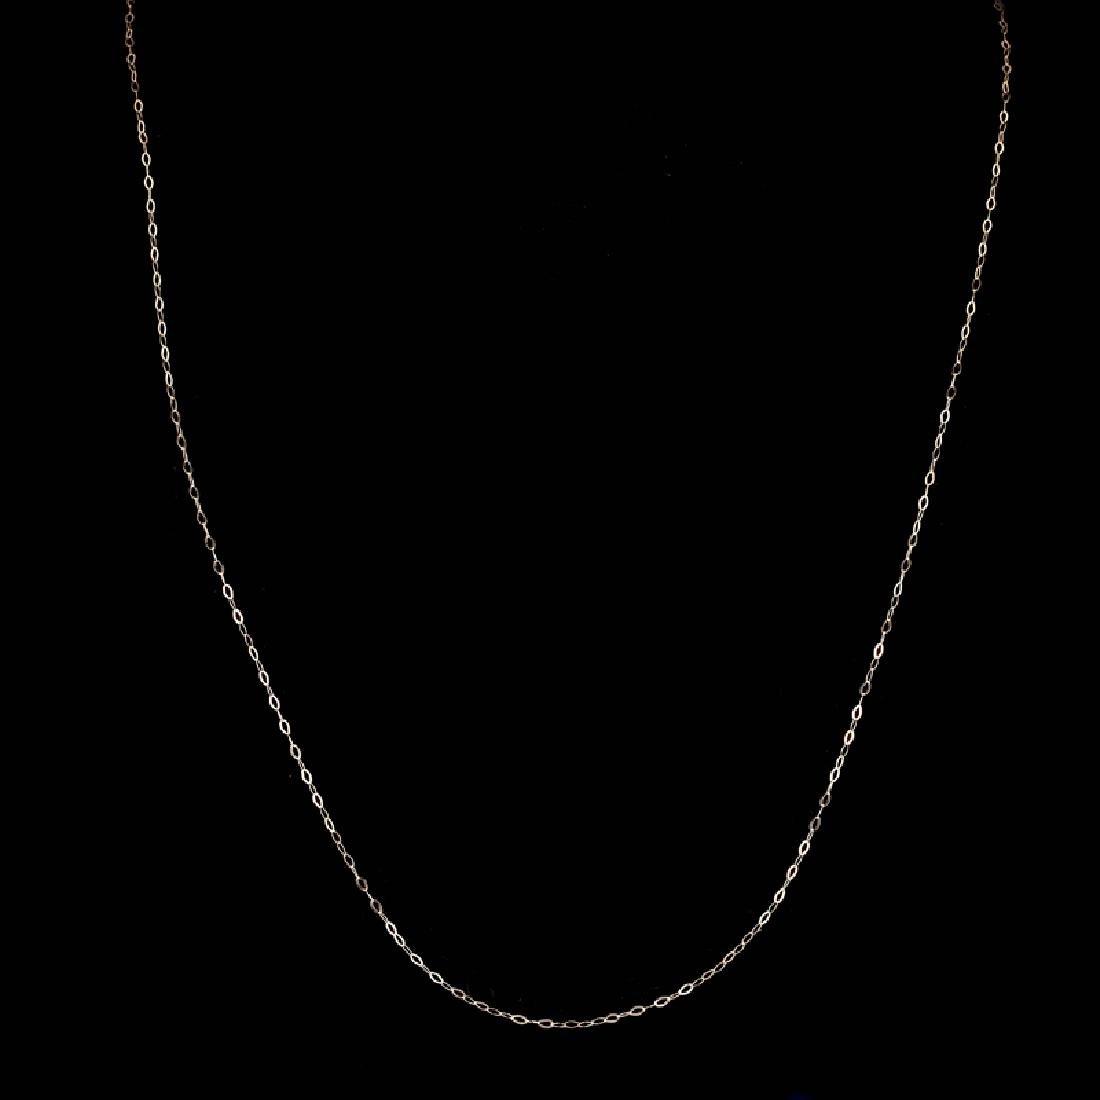 *Fine Jewelry 14 KT White Gold, 18'' Diamond Cut Link